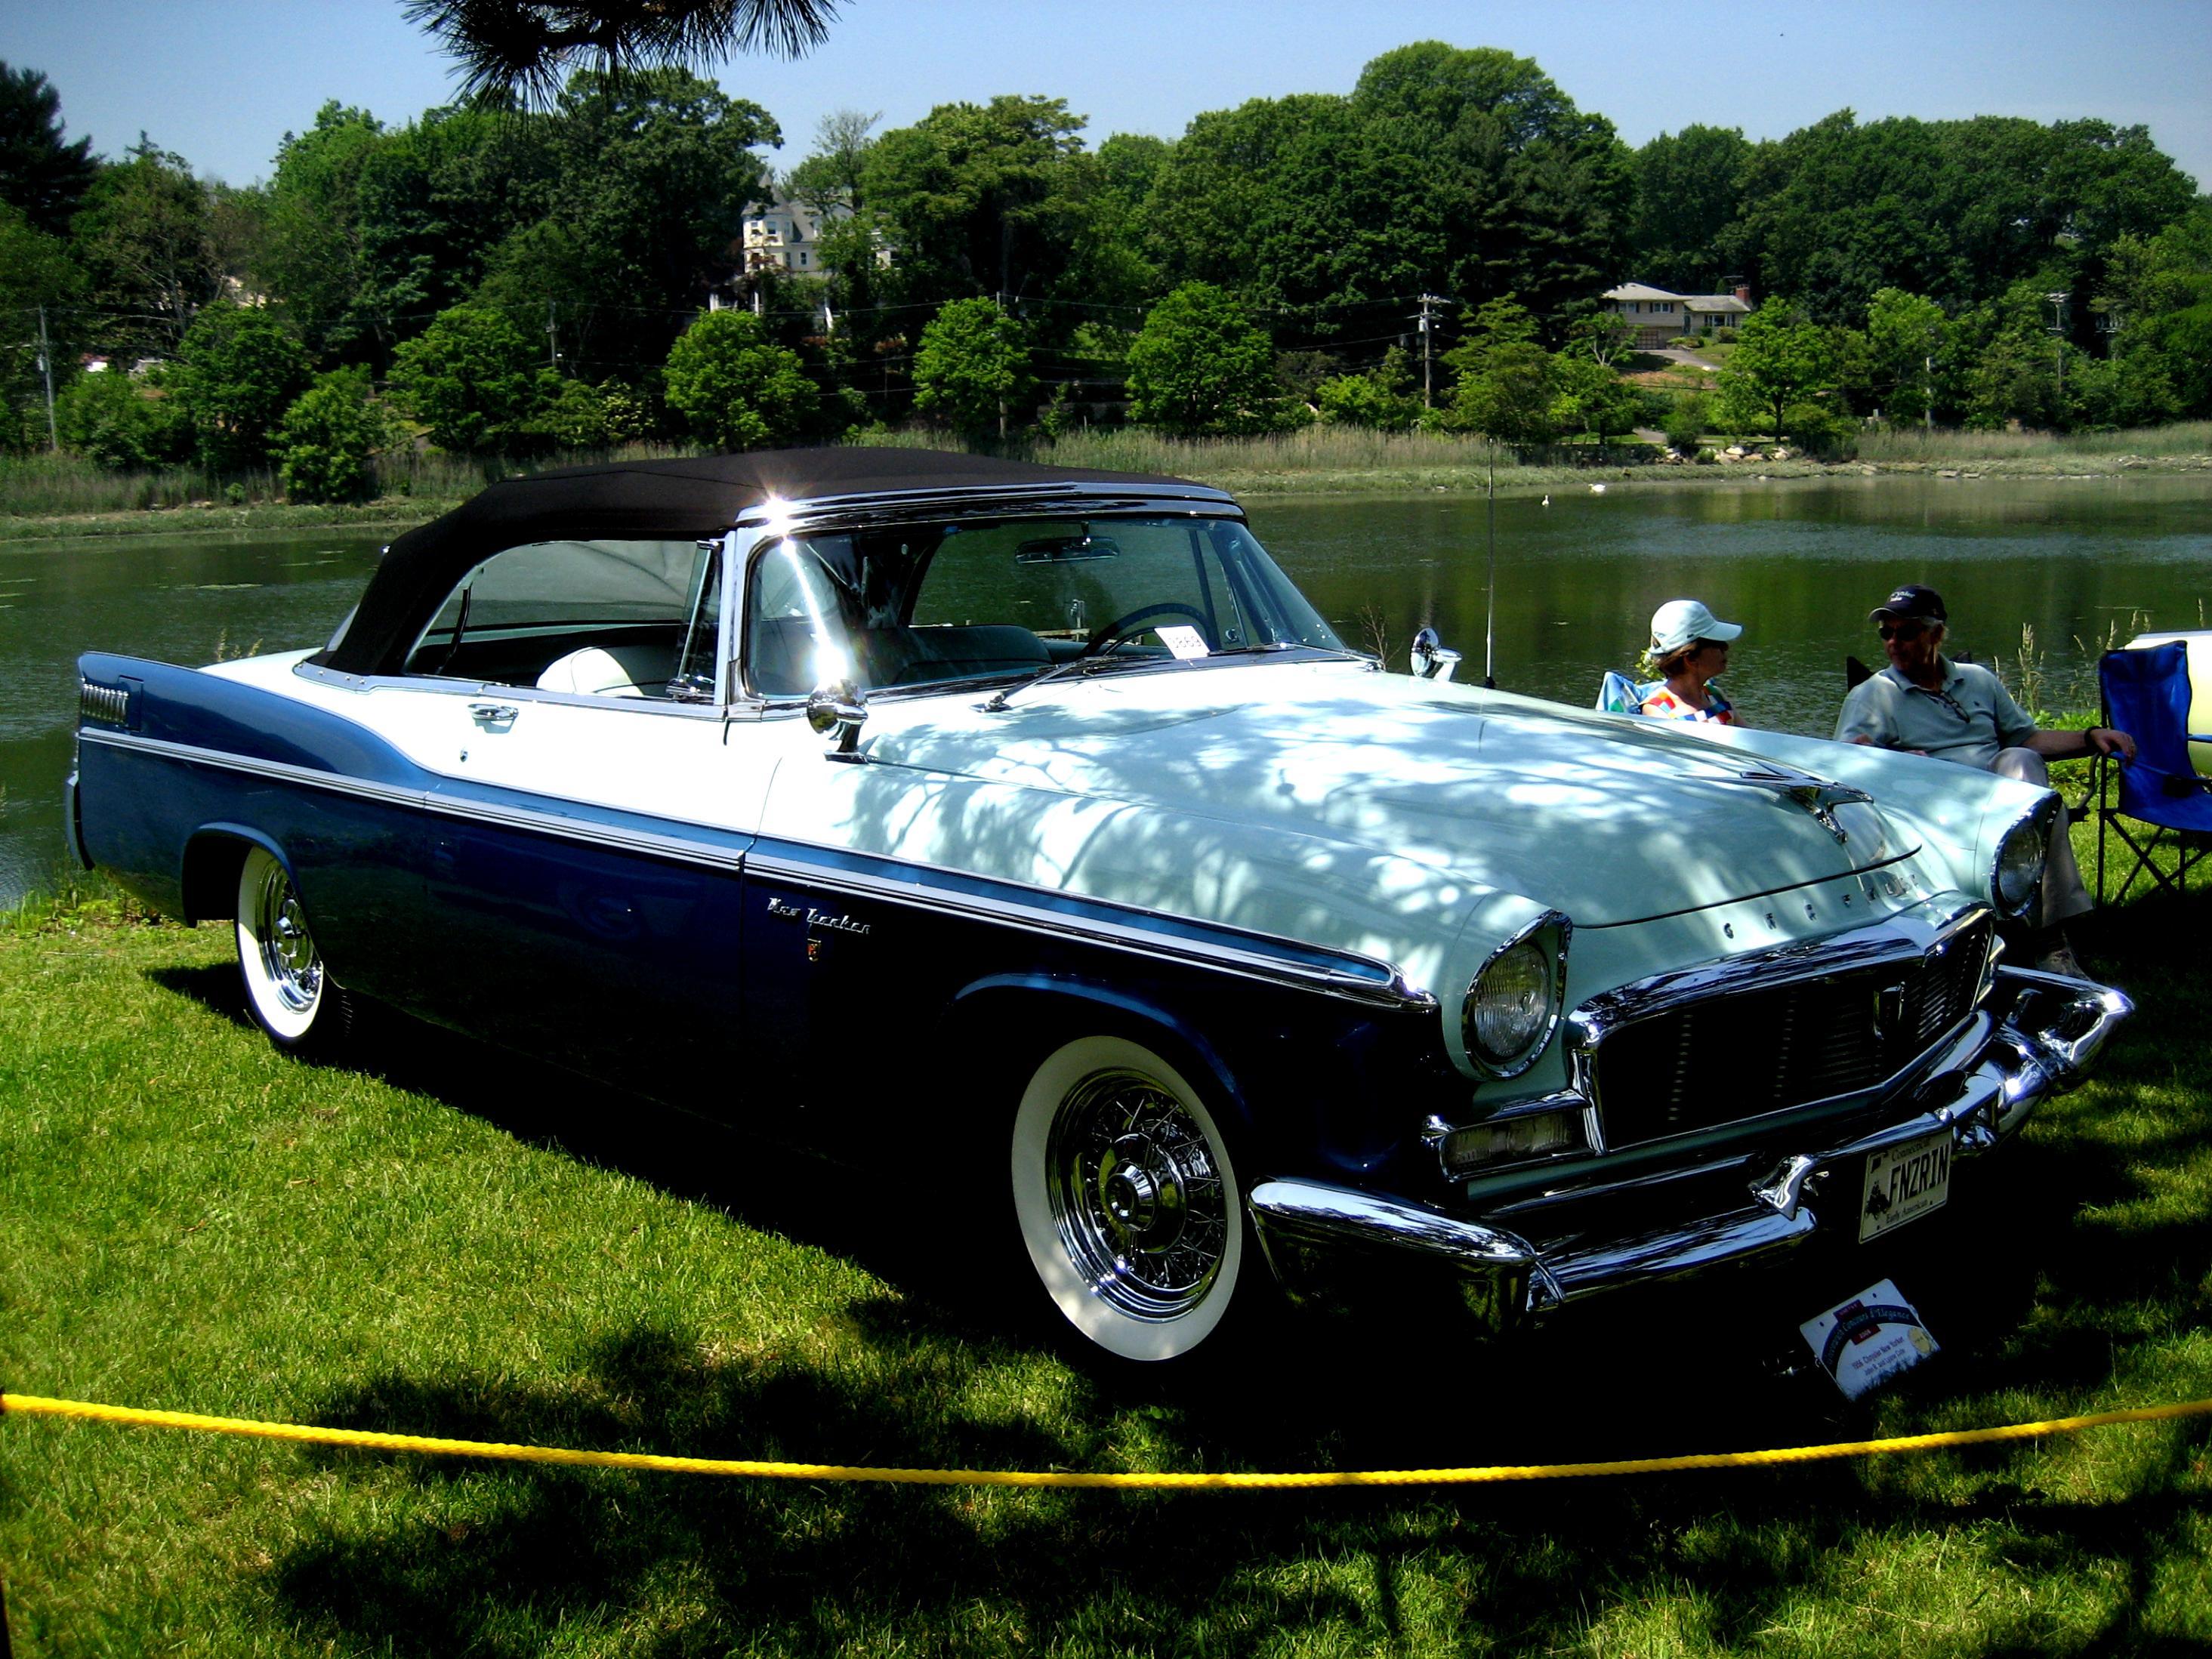 bark money rental can best m car rear rent chrysler image review the